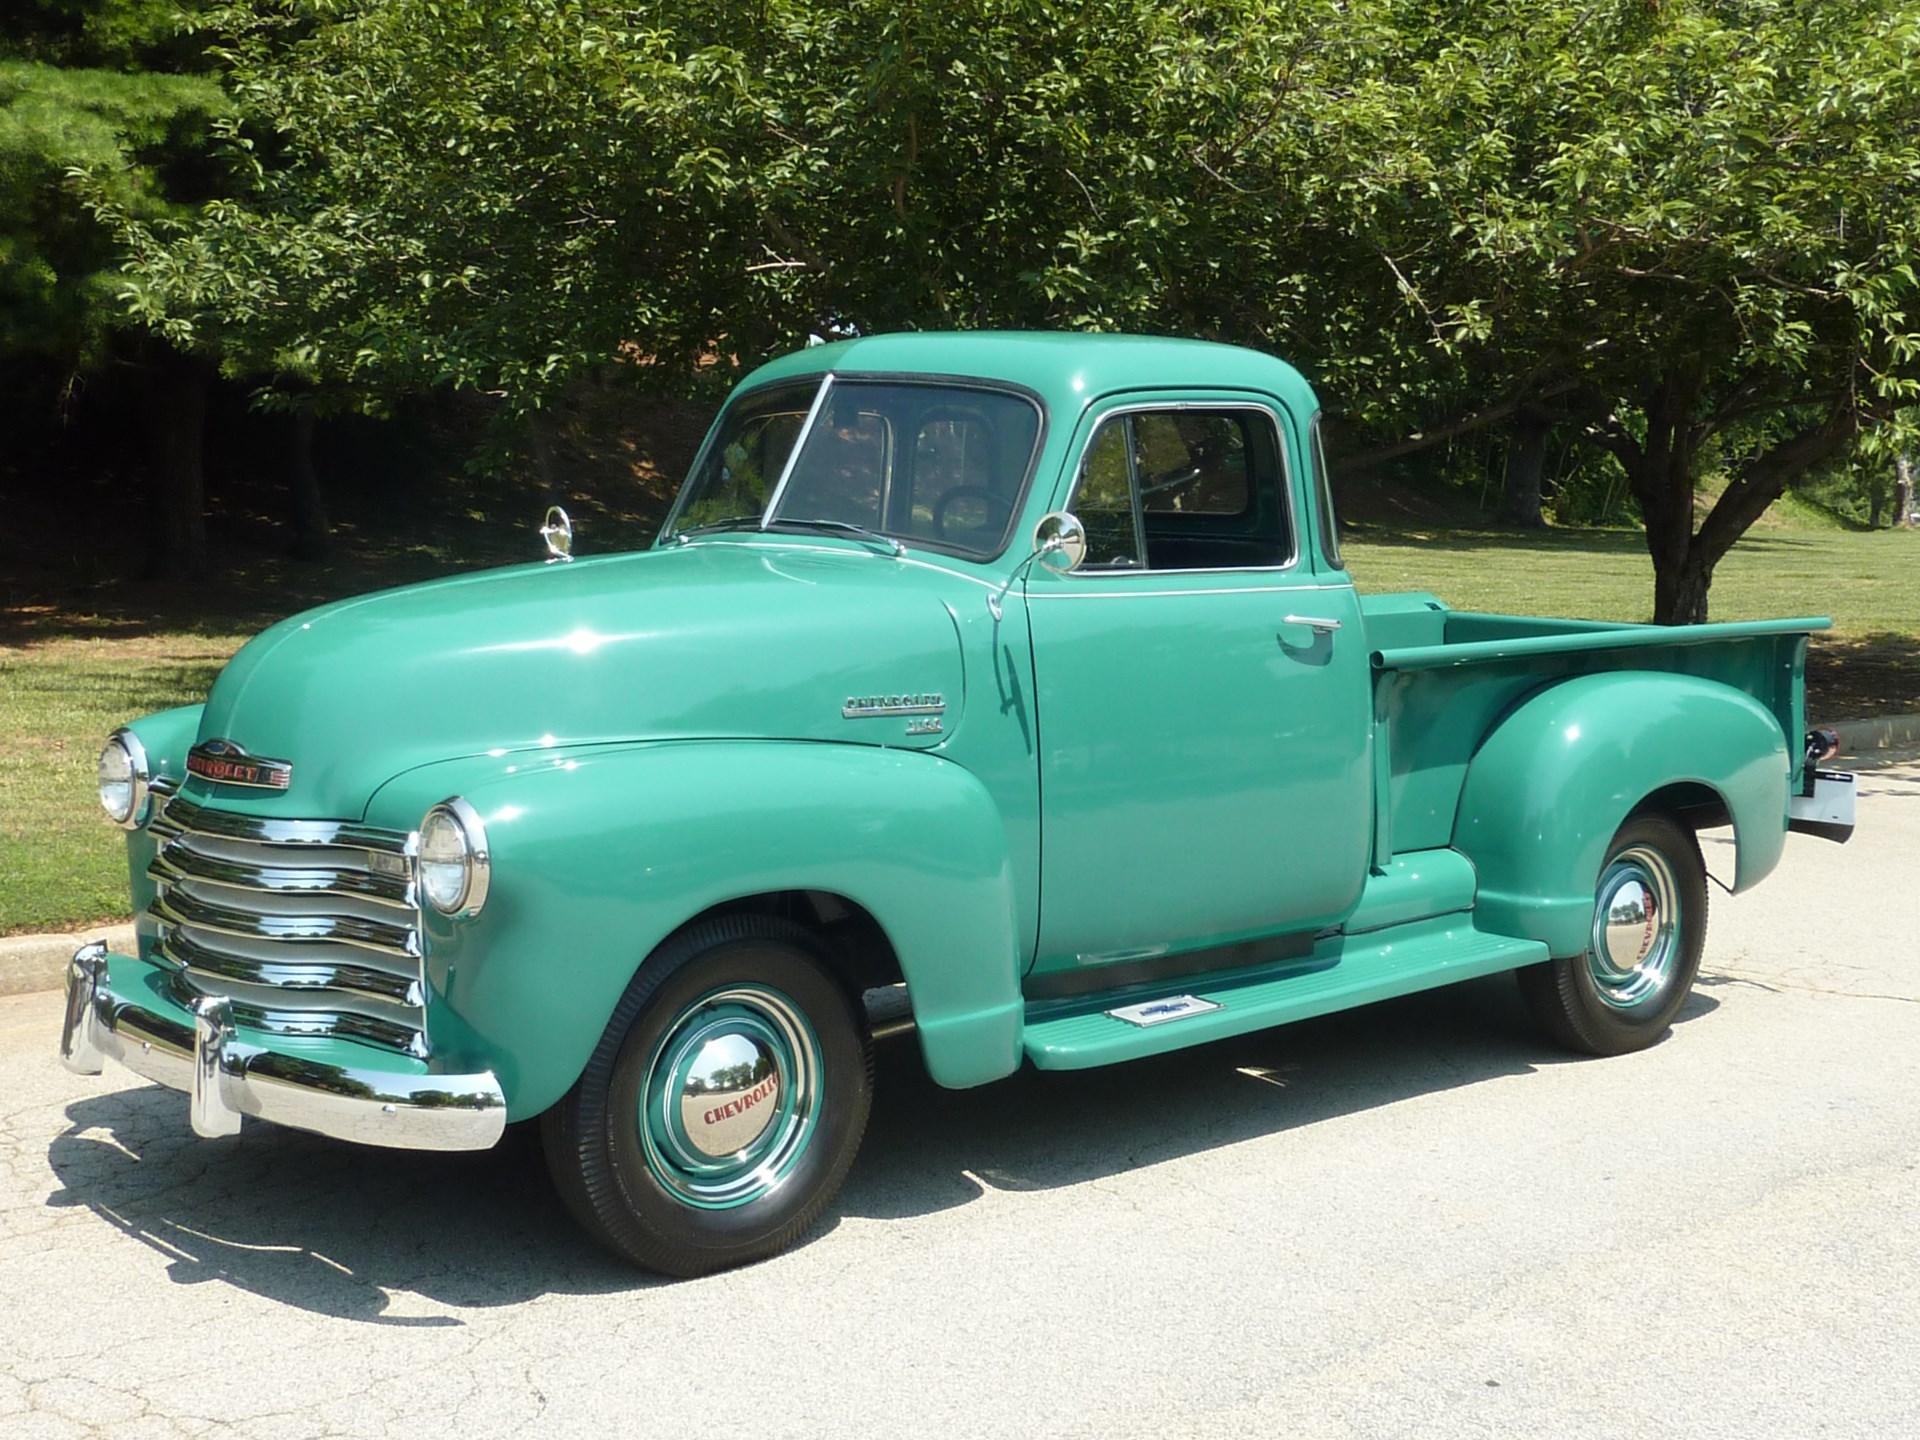 1951 Chevrolet 3100 5 Window Pickup Truck